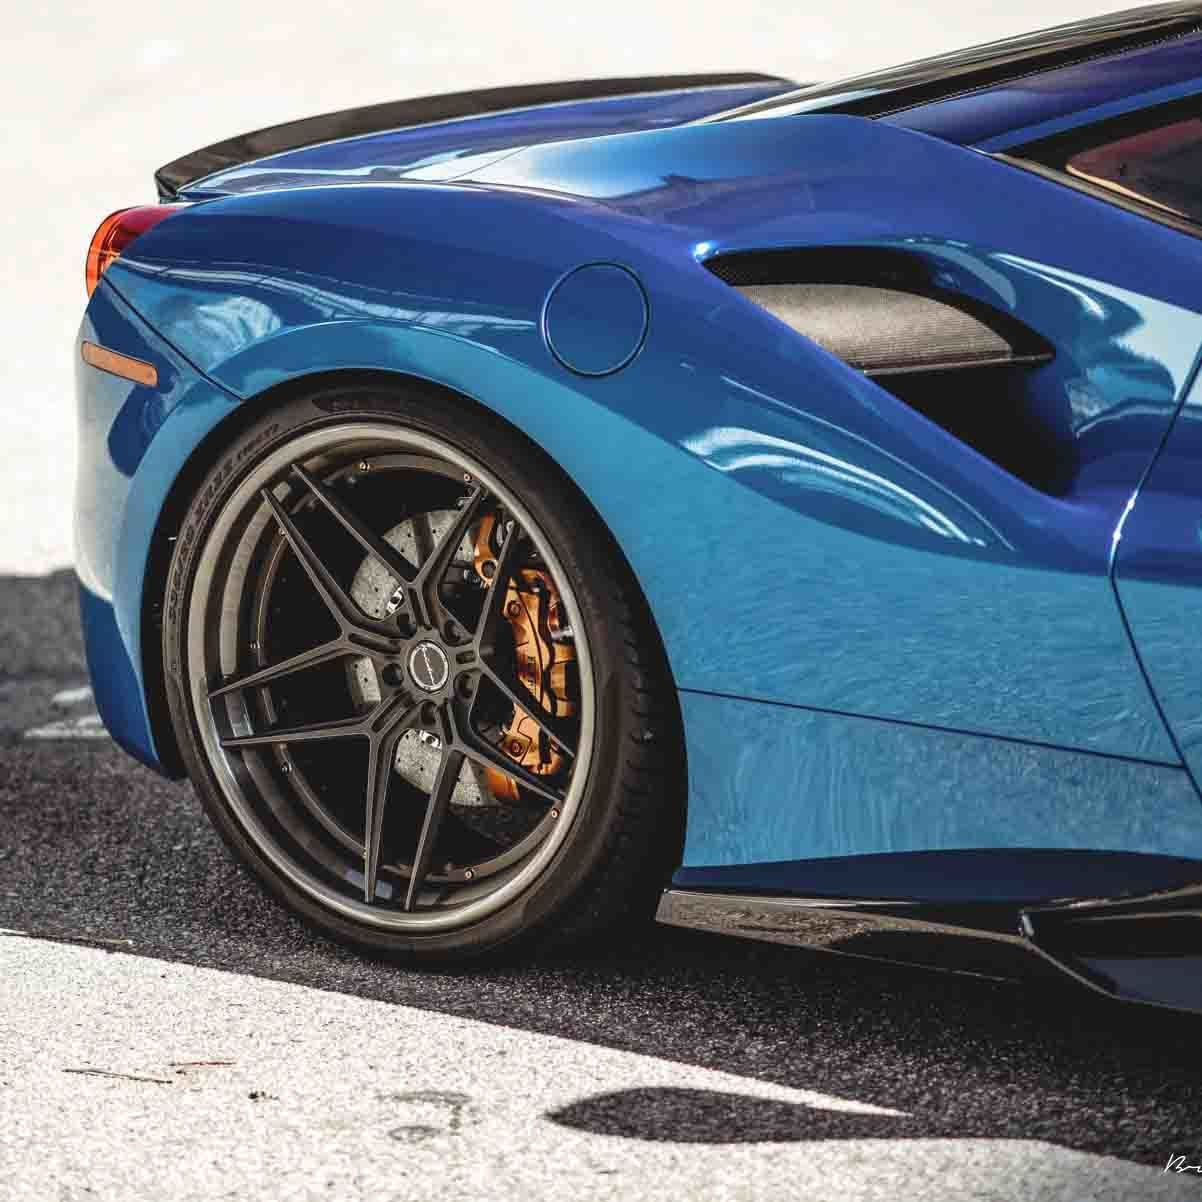 images-products-1-2455-232974743-blue-ferrari-488-gtb-brixton-forged-wr7-targa-series-brushed-smoke-black-wheels-01233.jpg